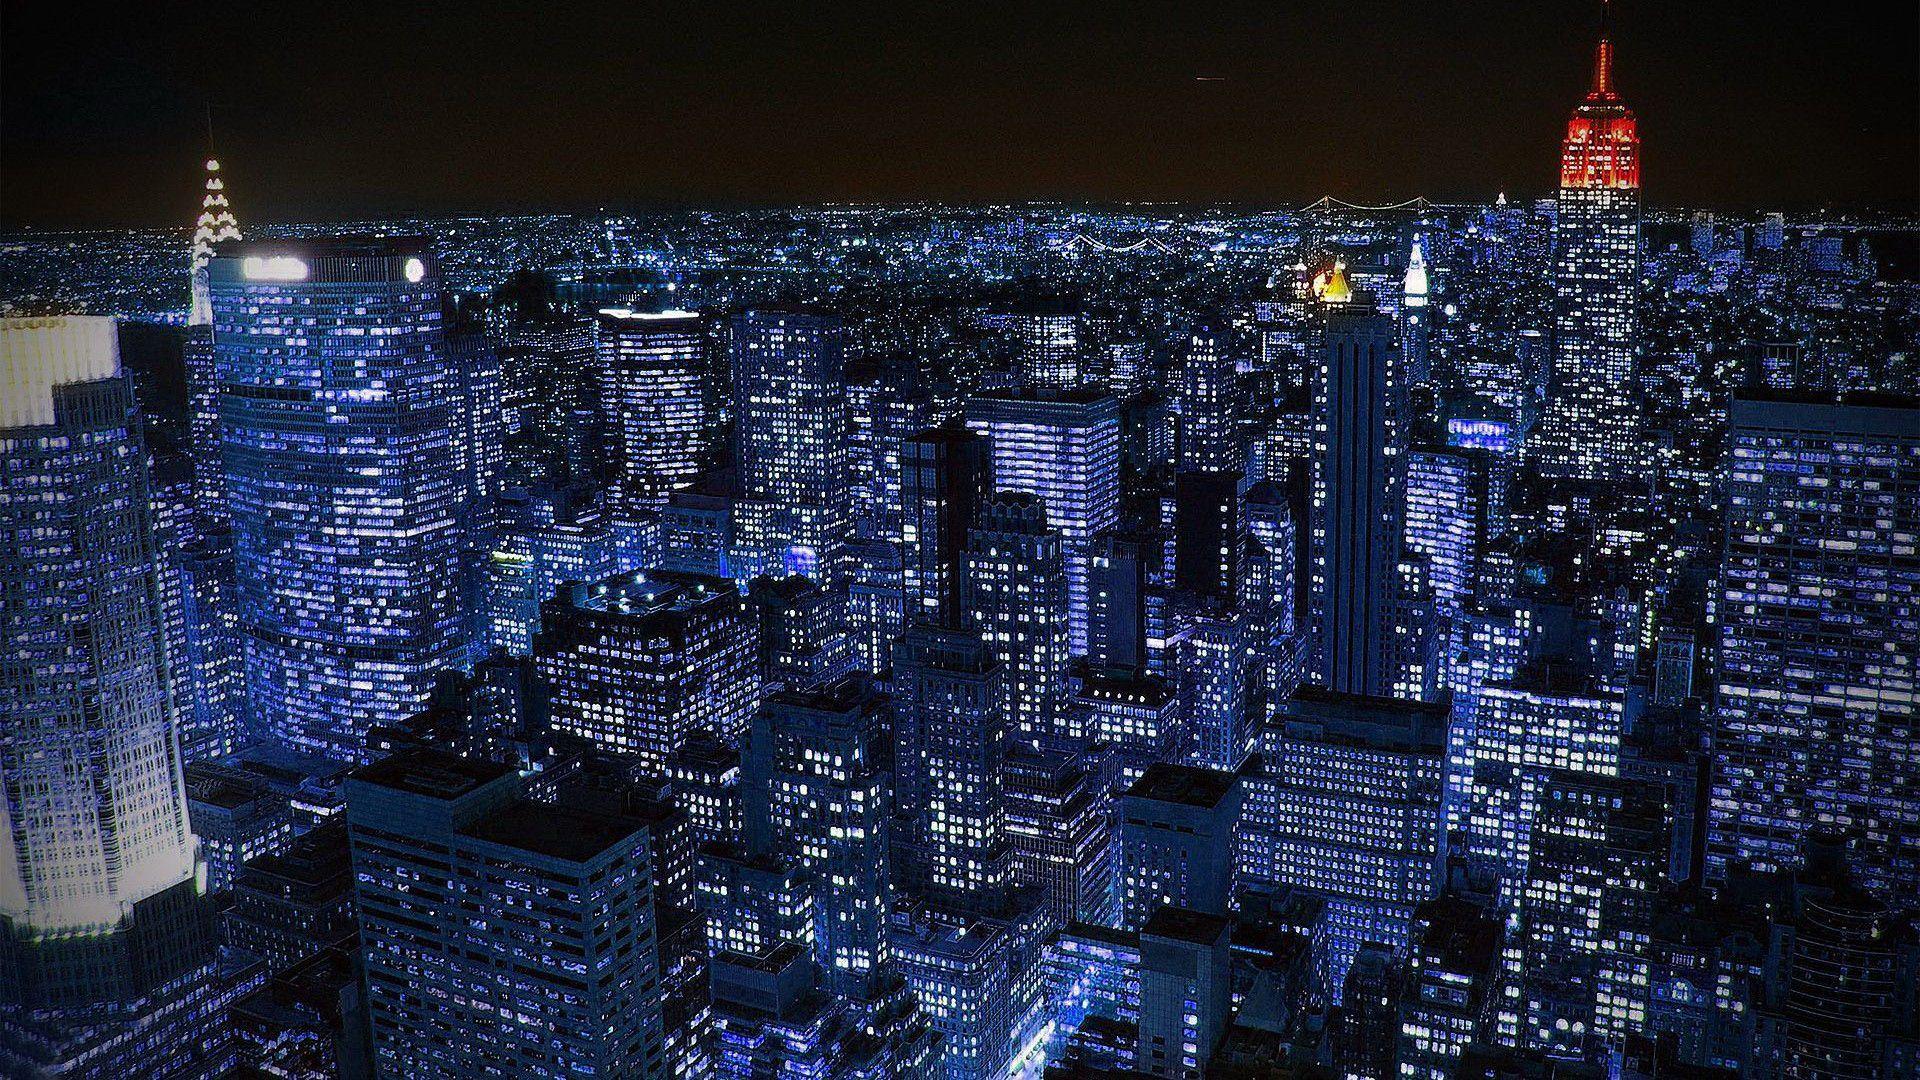 New York City At Night Desktop Wallpaper City Wallpaper Nyc At Night New York Wallpaper